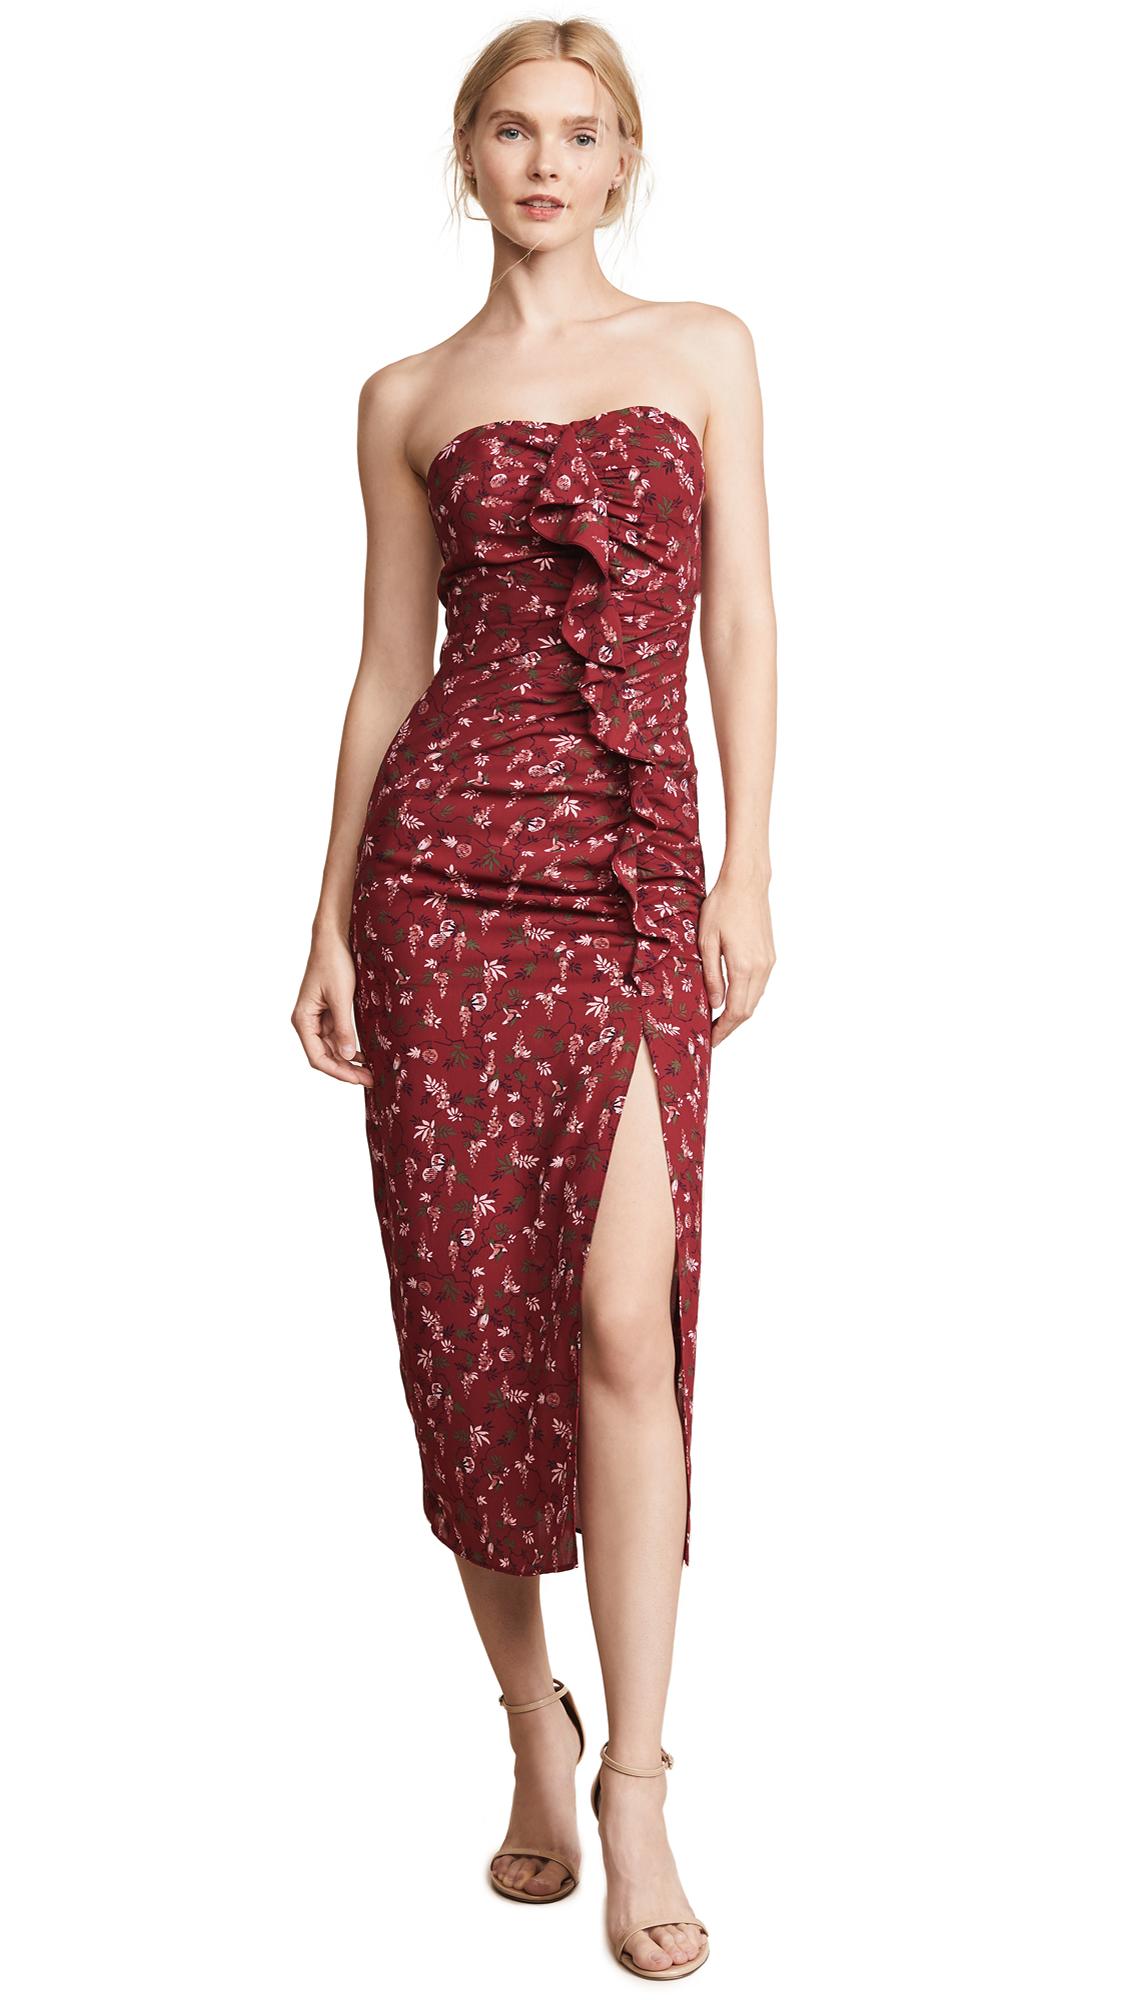 LIKELY Ali Dress In Rumba Red Multi